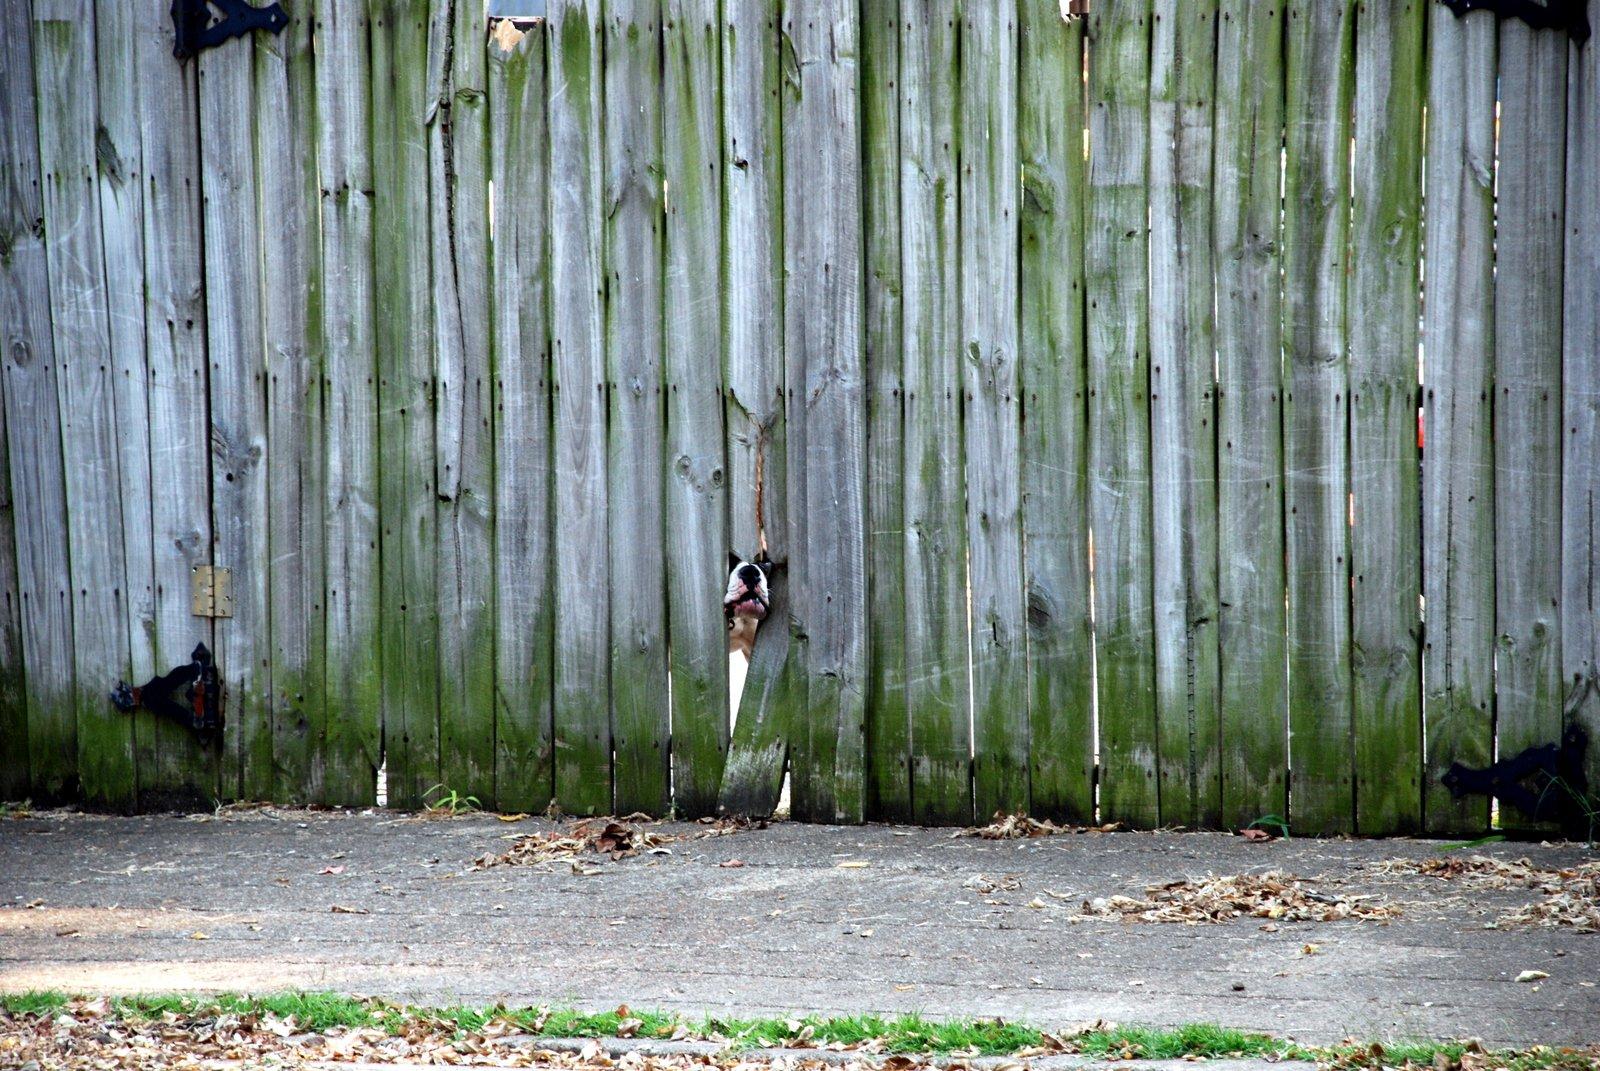 Mean dog behind fence